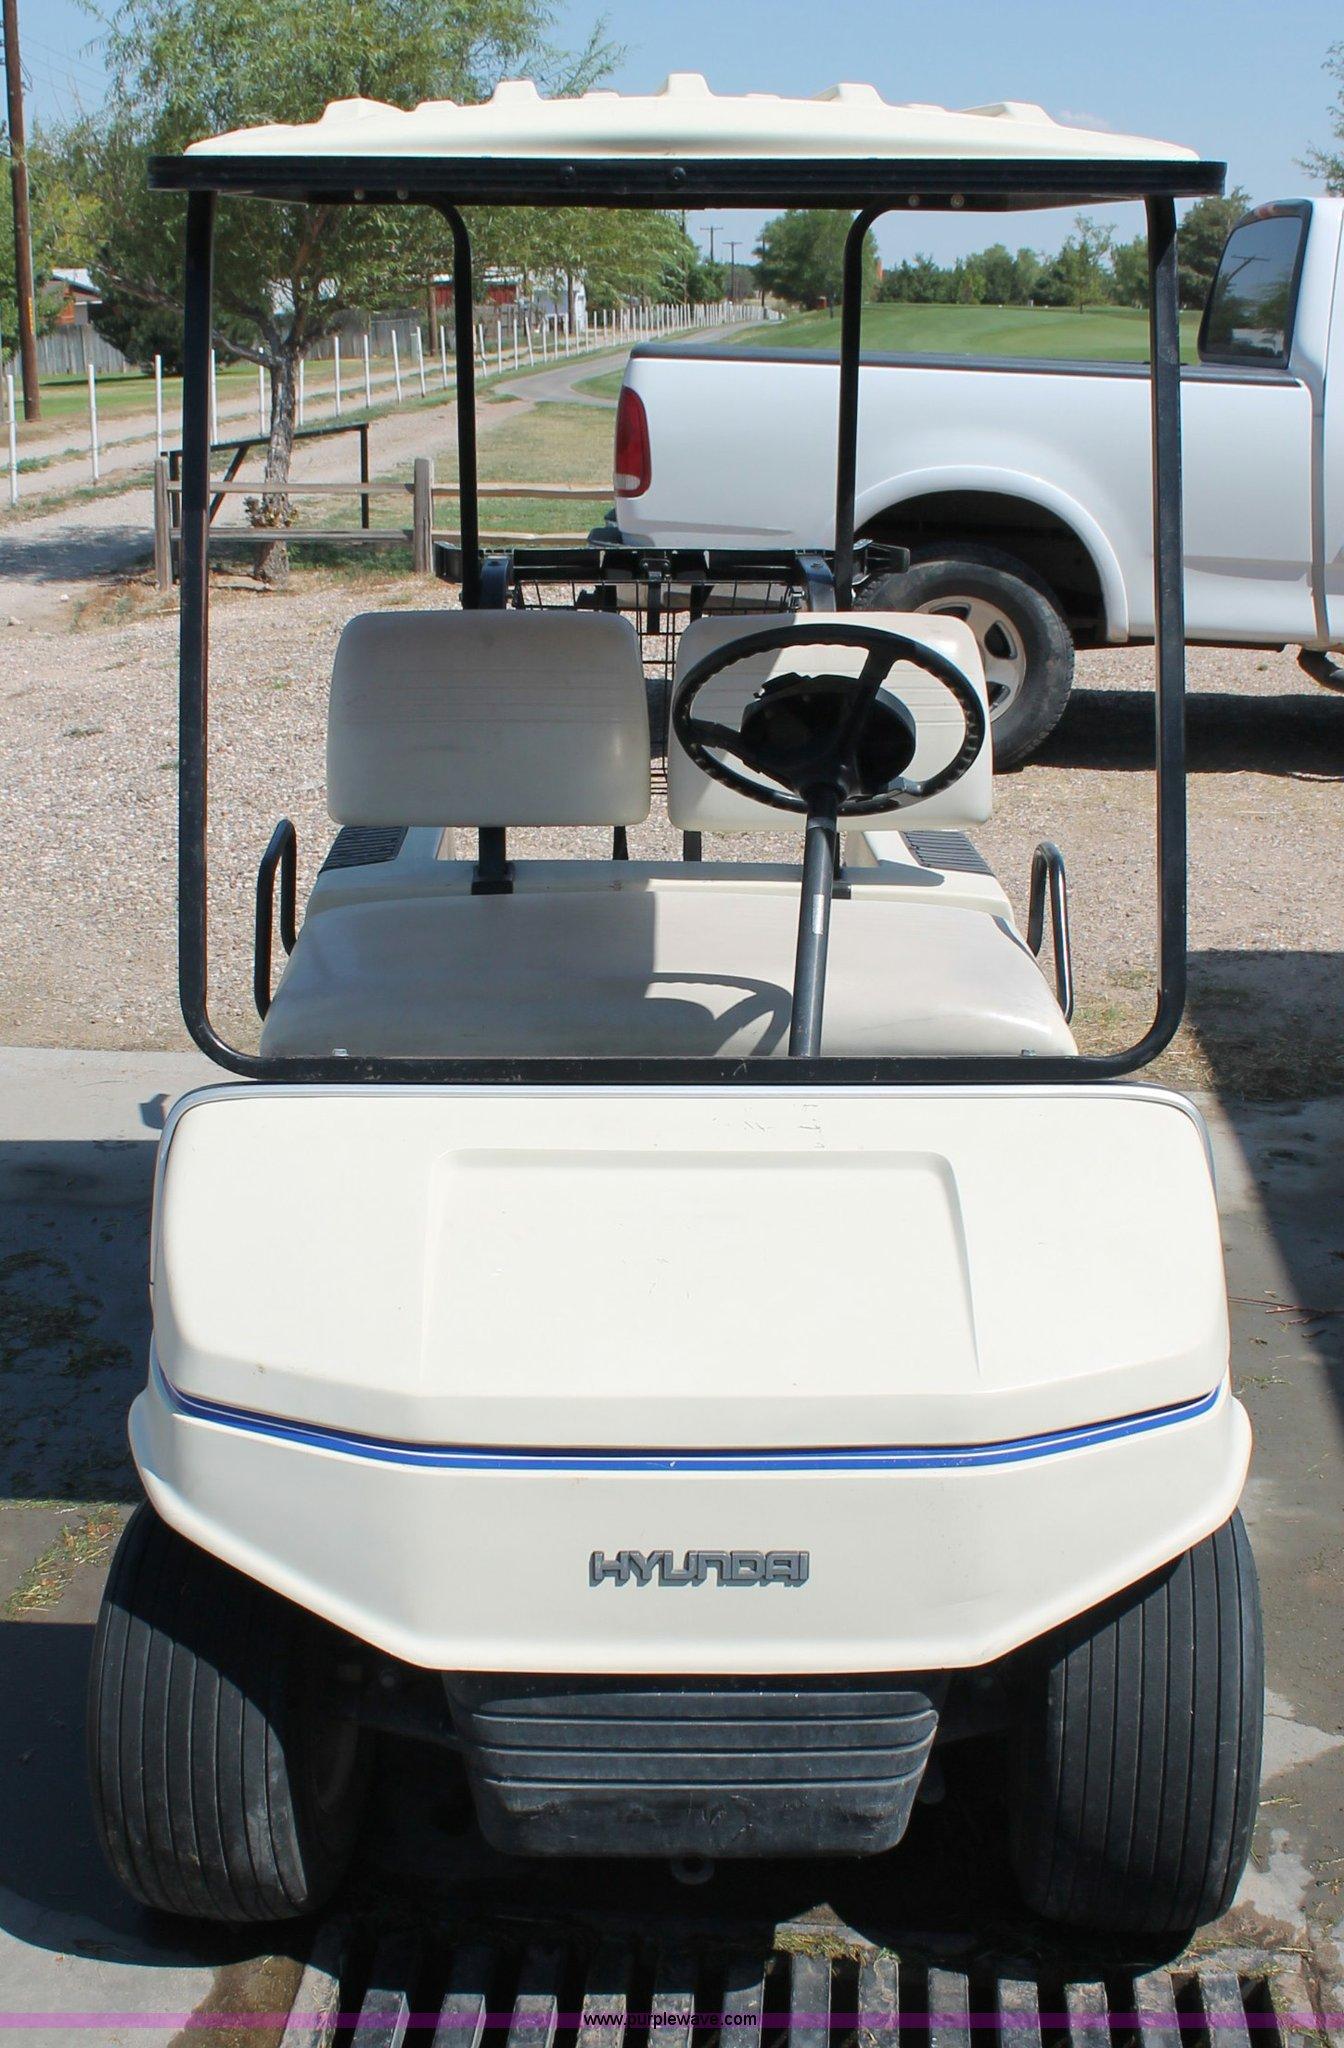 Hyundai golf cart | Item C2698 | SOLD! Tuesday August 7 Gove... on hyundai used cars, hyundai offroad, hyundai container, hyundai service center, hyundai loader, hyundai golf caps, hyundai car dealership, hyundai air compressor, hyundai bus,